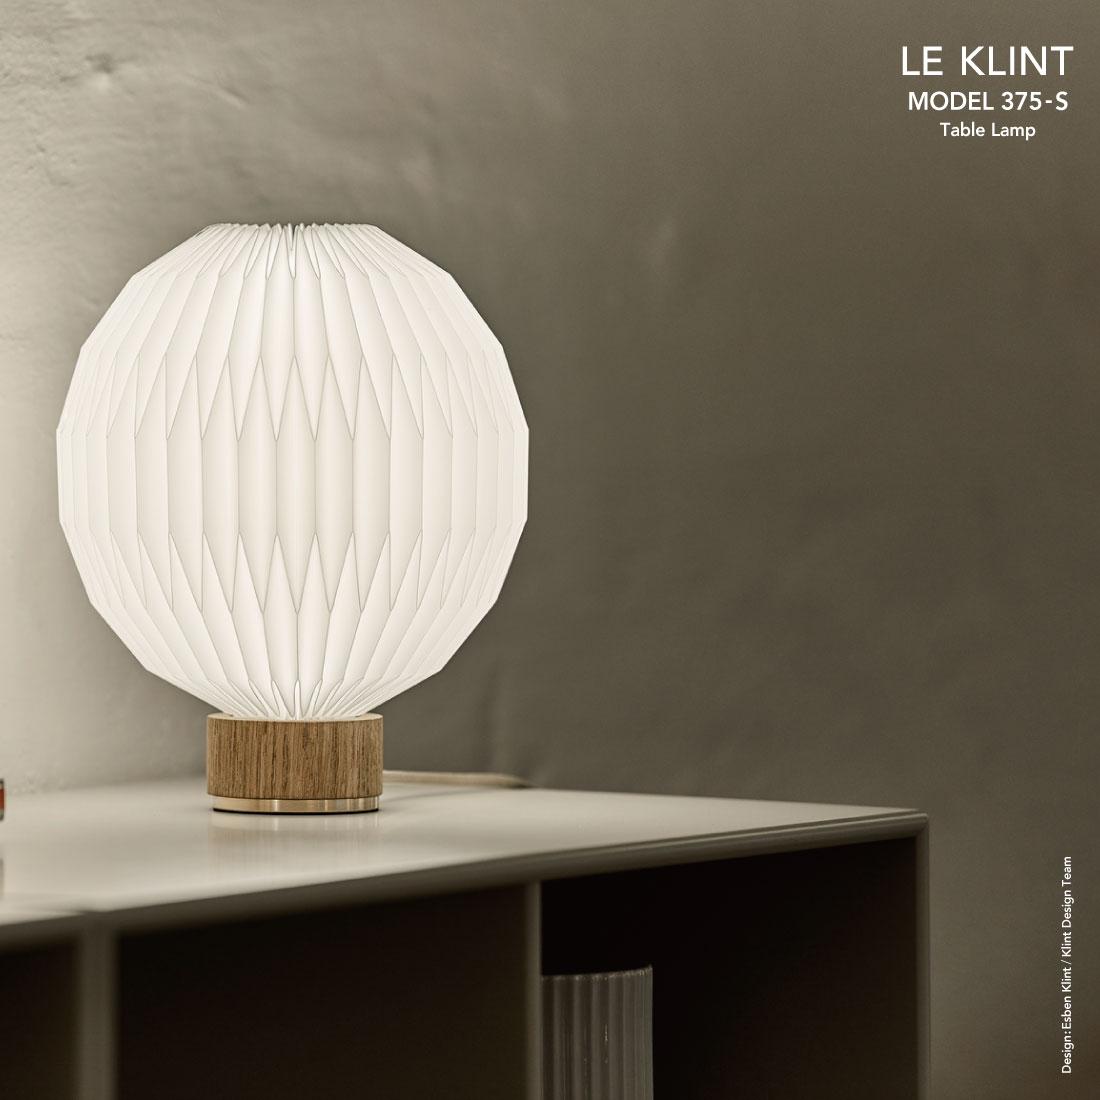 【LE KLINT/レ・クリント】MODEL 375 Small Table lamp Esben Klint/モデル375/スモール/テーブルランプ/エスベン・クリント/照明/デンマーク/北欧/デンマーク